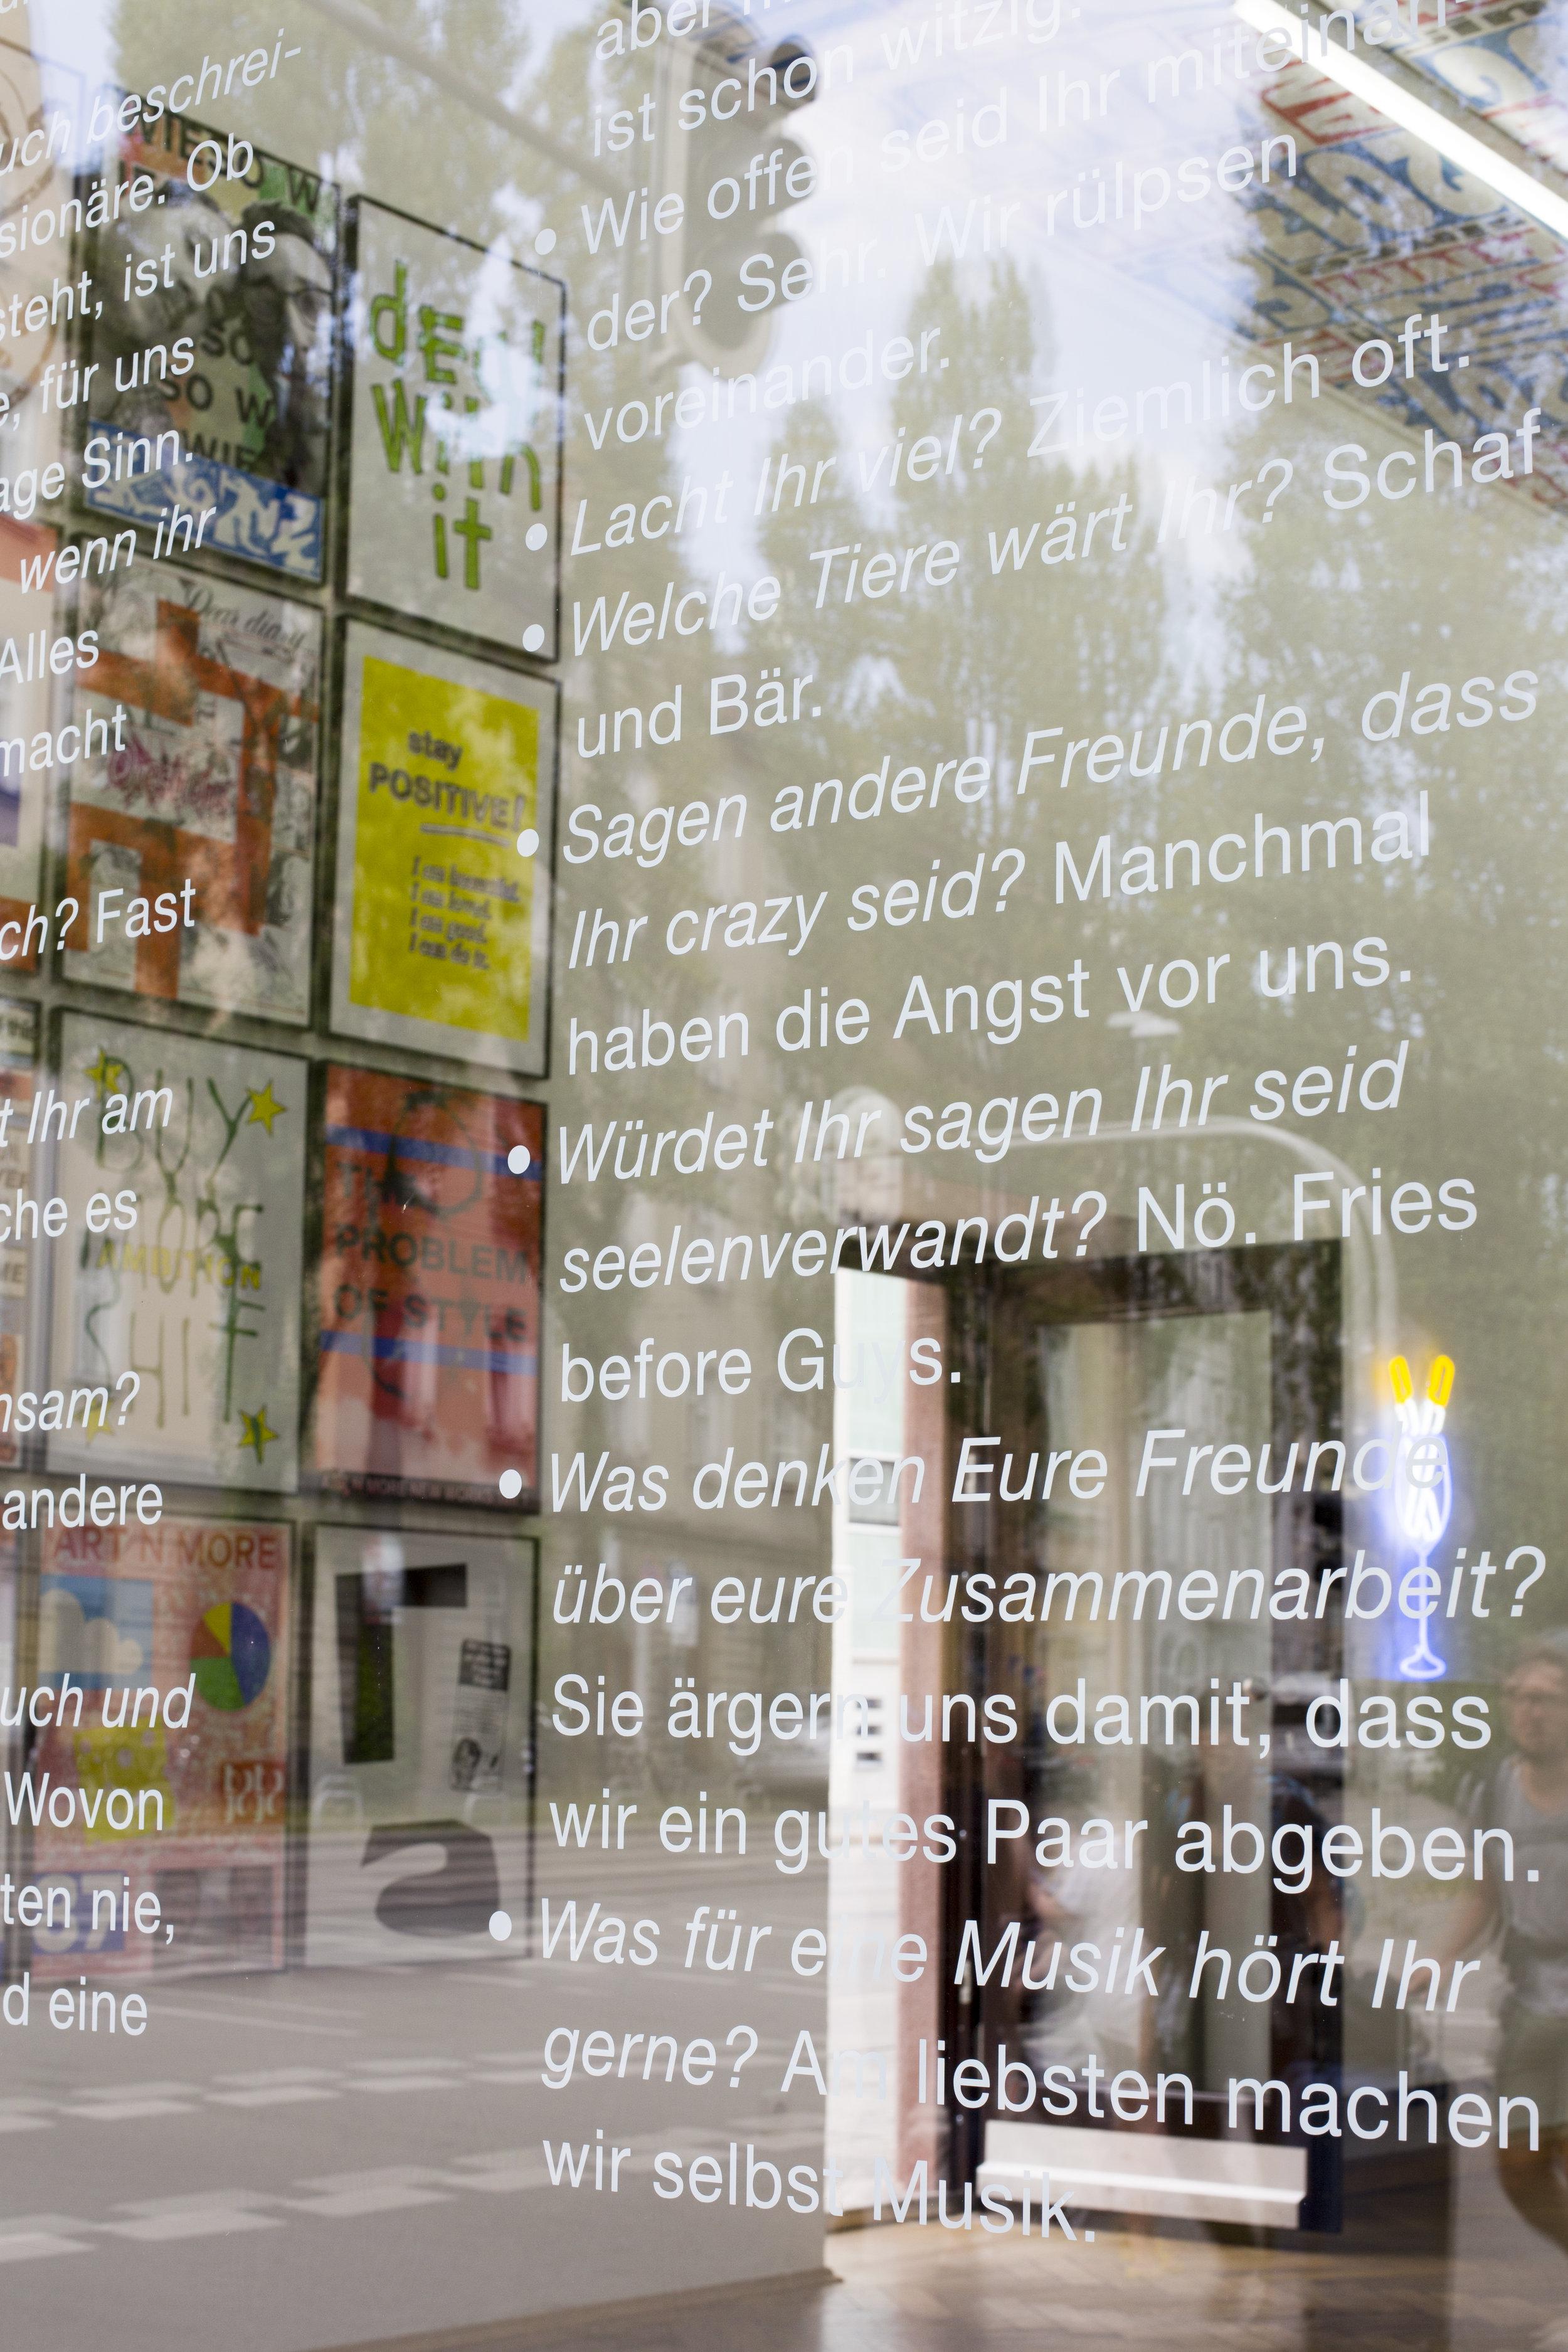 Installation View, ART N MORE NEW WORKS TEIL I, 2016, SPERLING Munich